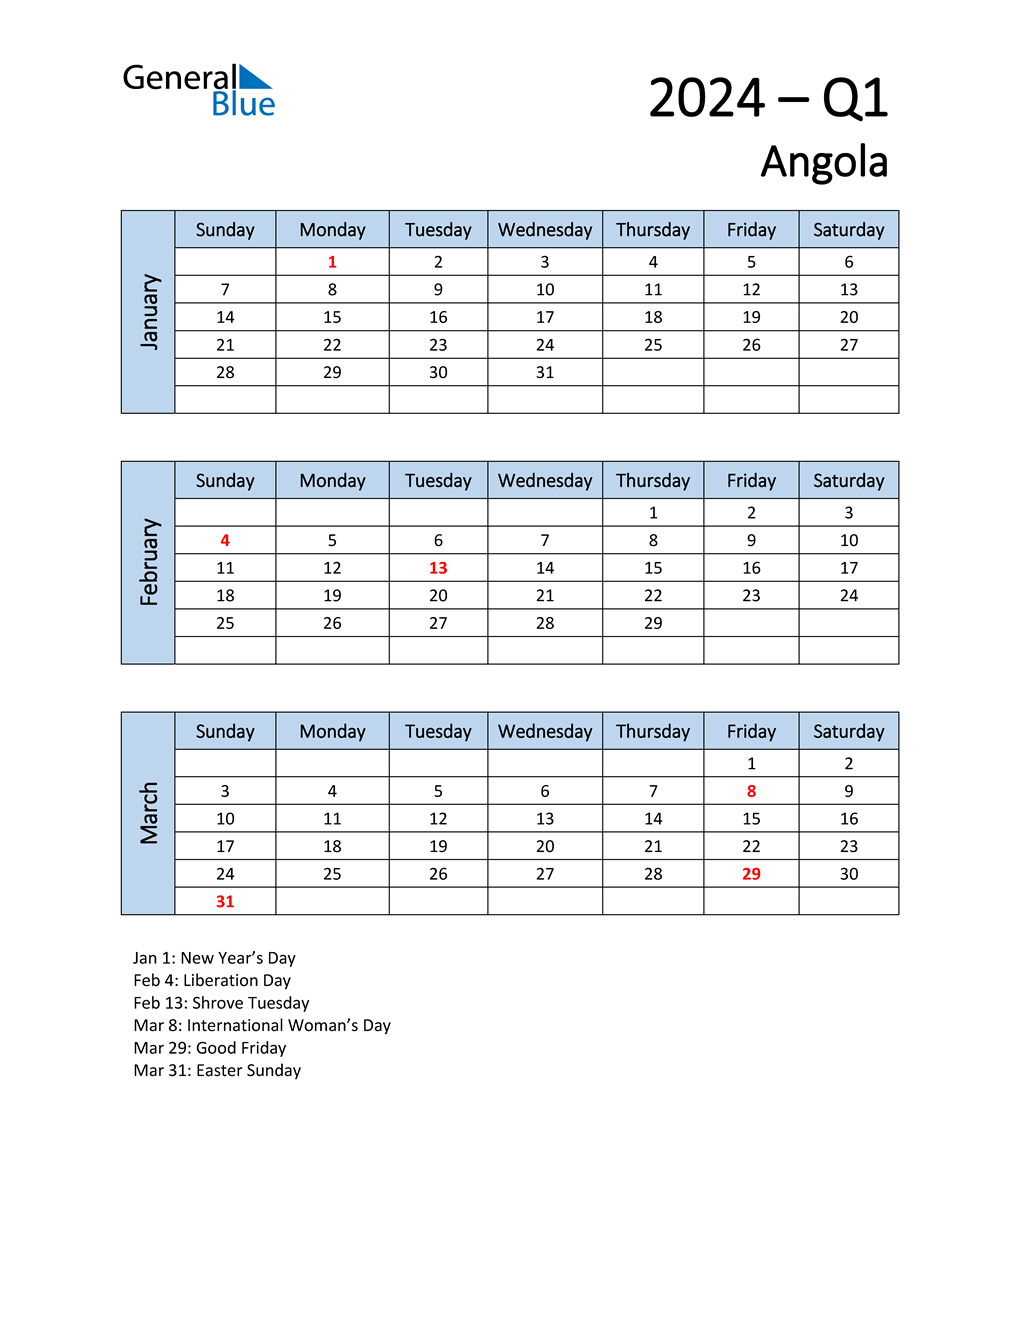 Free Q1 2024 Calendar for Angola